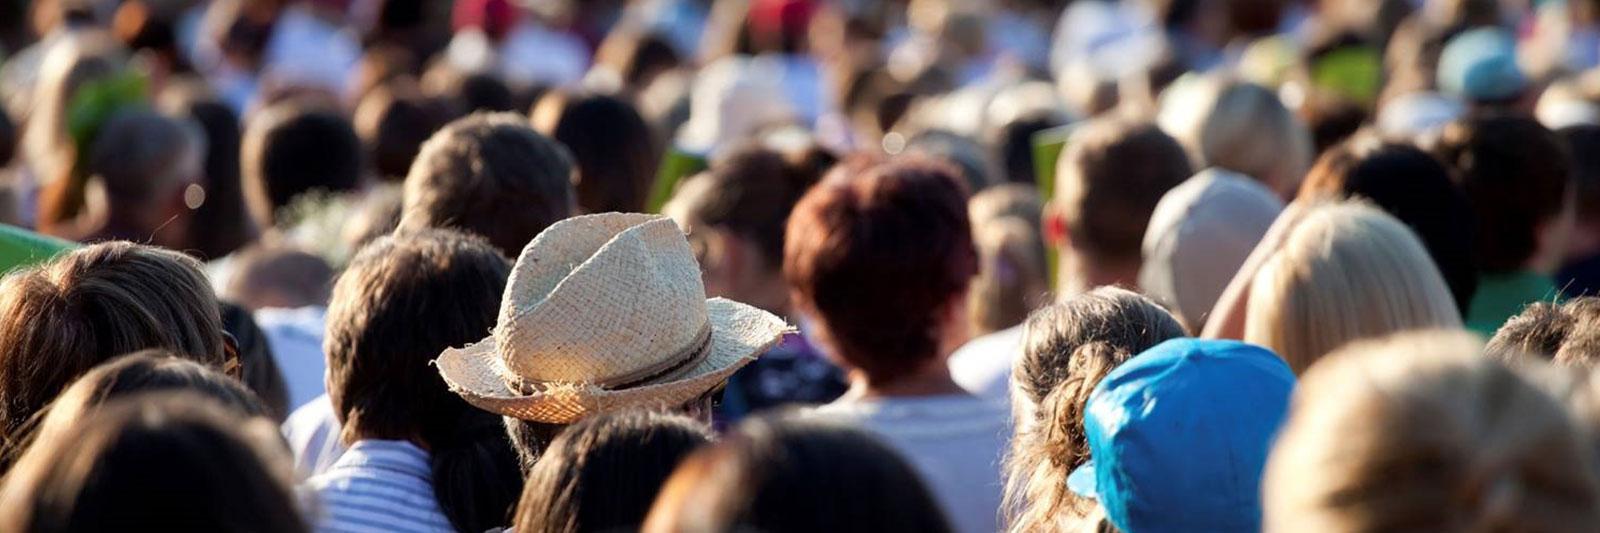 crowd-1600x533.jpg